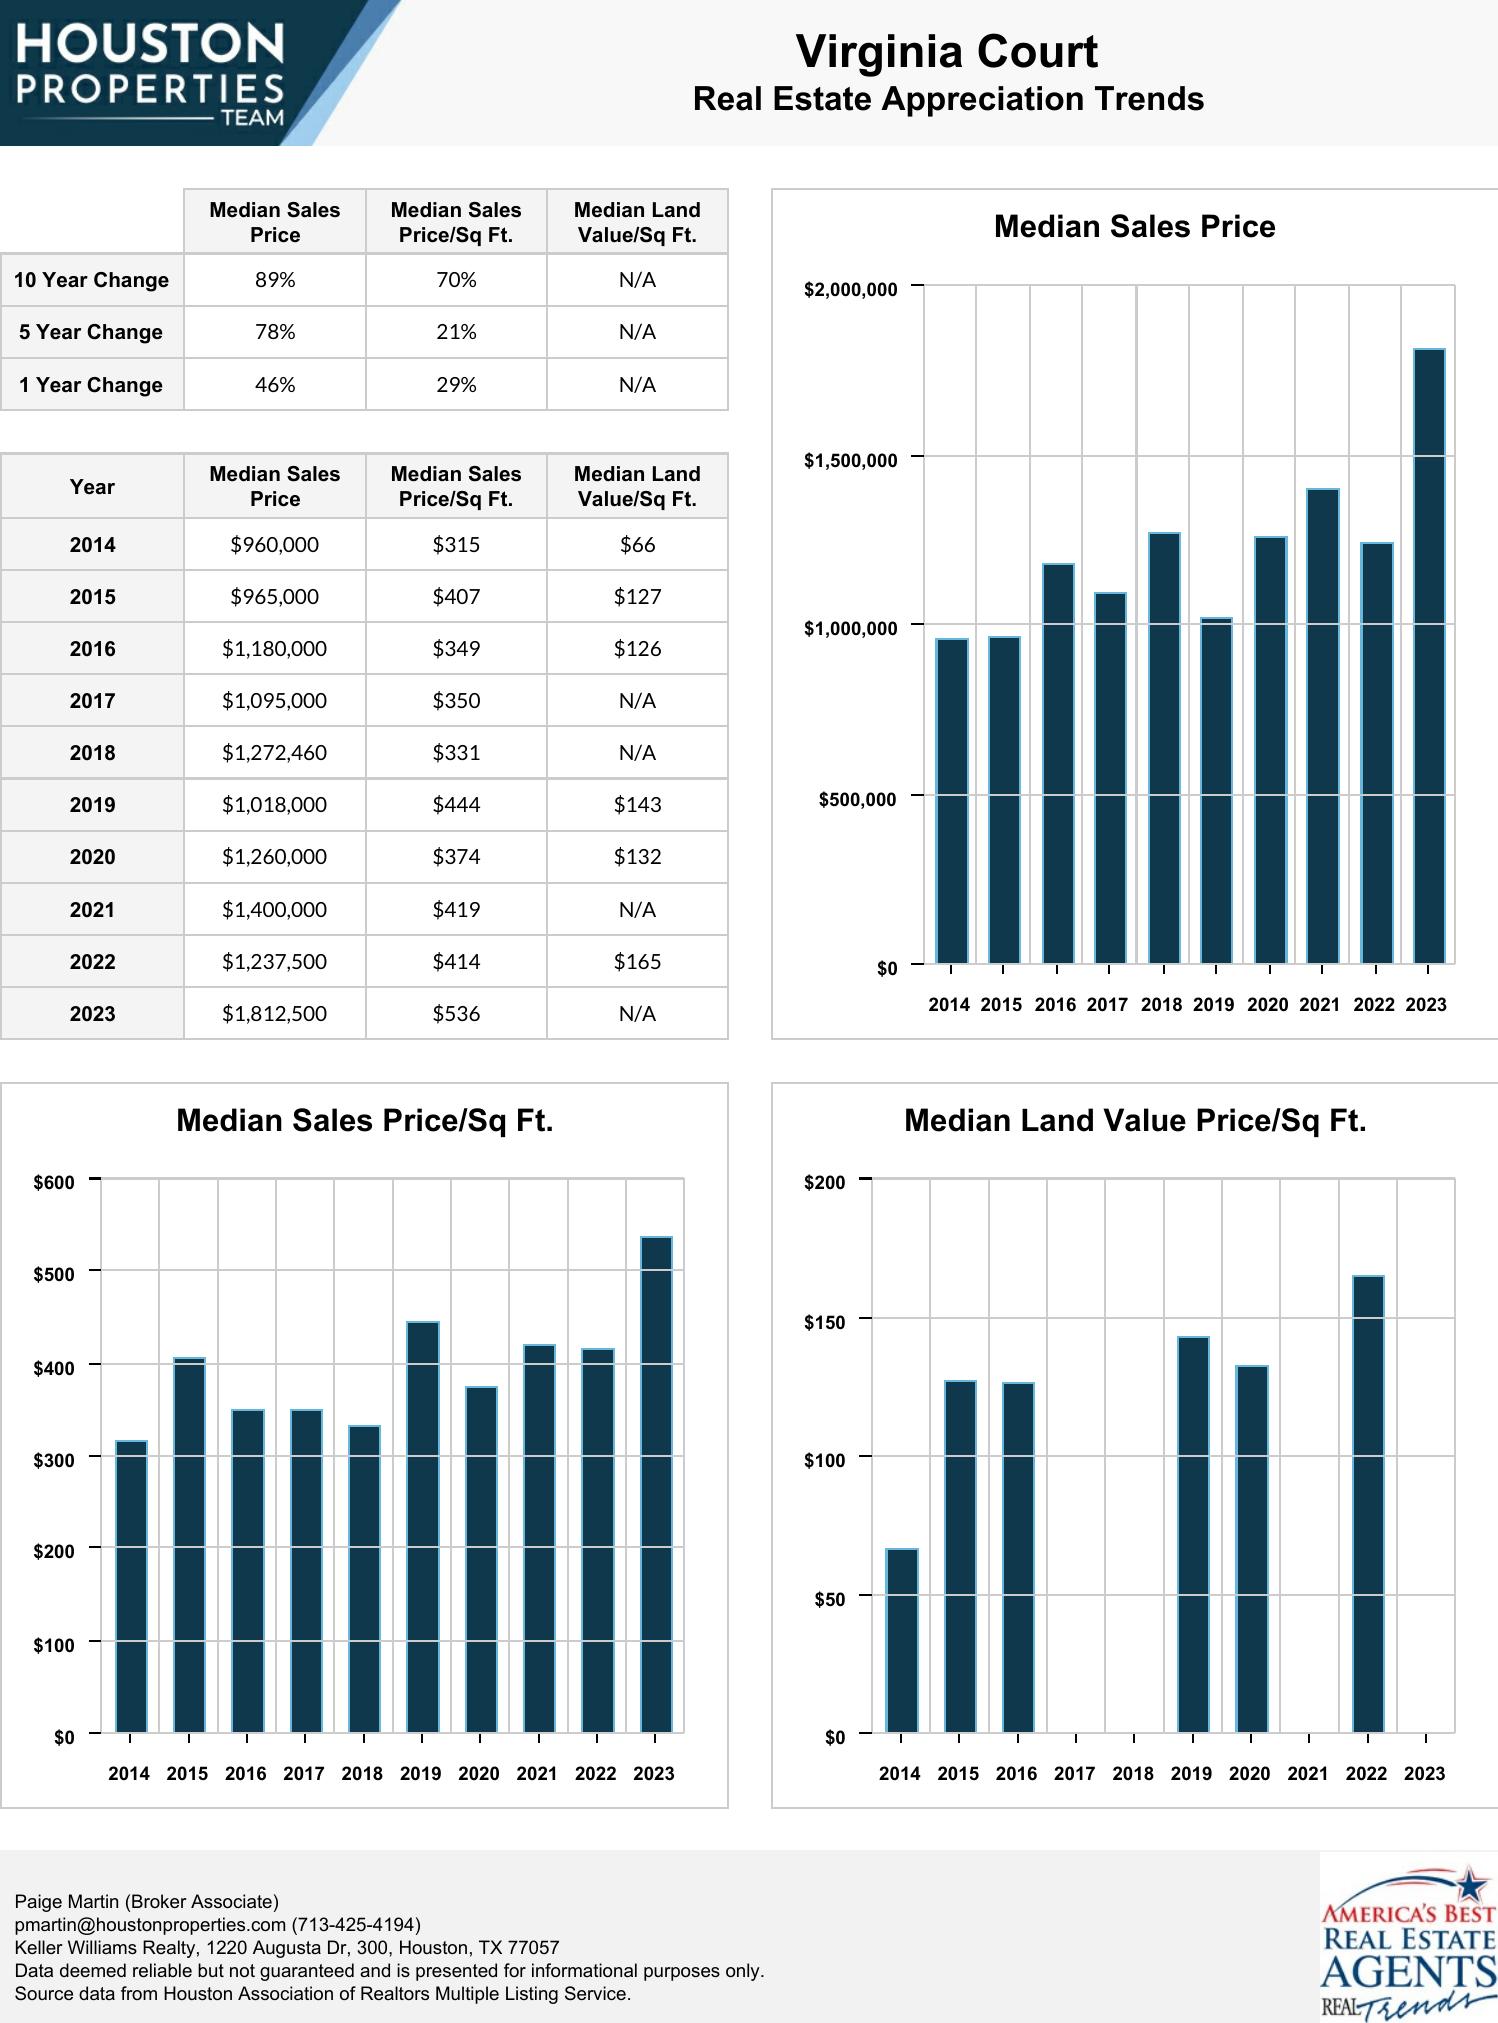 Virginia Court Real Estate Trends